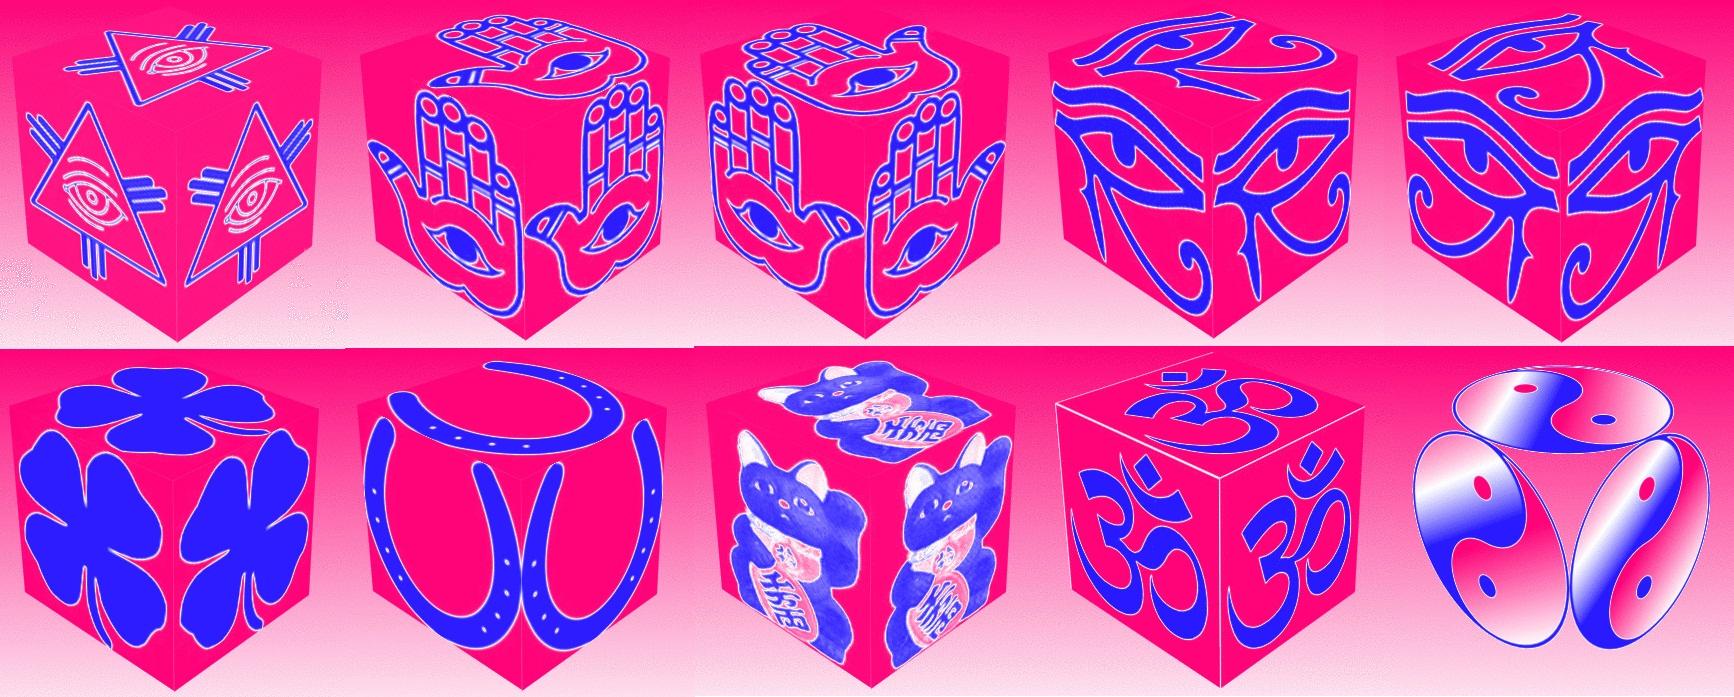 cube, 3d cube, lucky dice, luck symbols, Tritone Eye of Fatima, Tritone Eye of Providence, Tritone Four Leaf Clover, Tritone Horseshoe, Tritone Maneki Neko